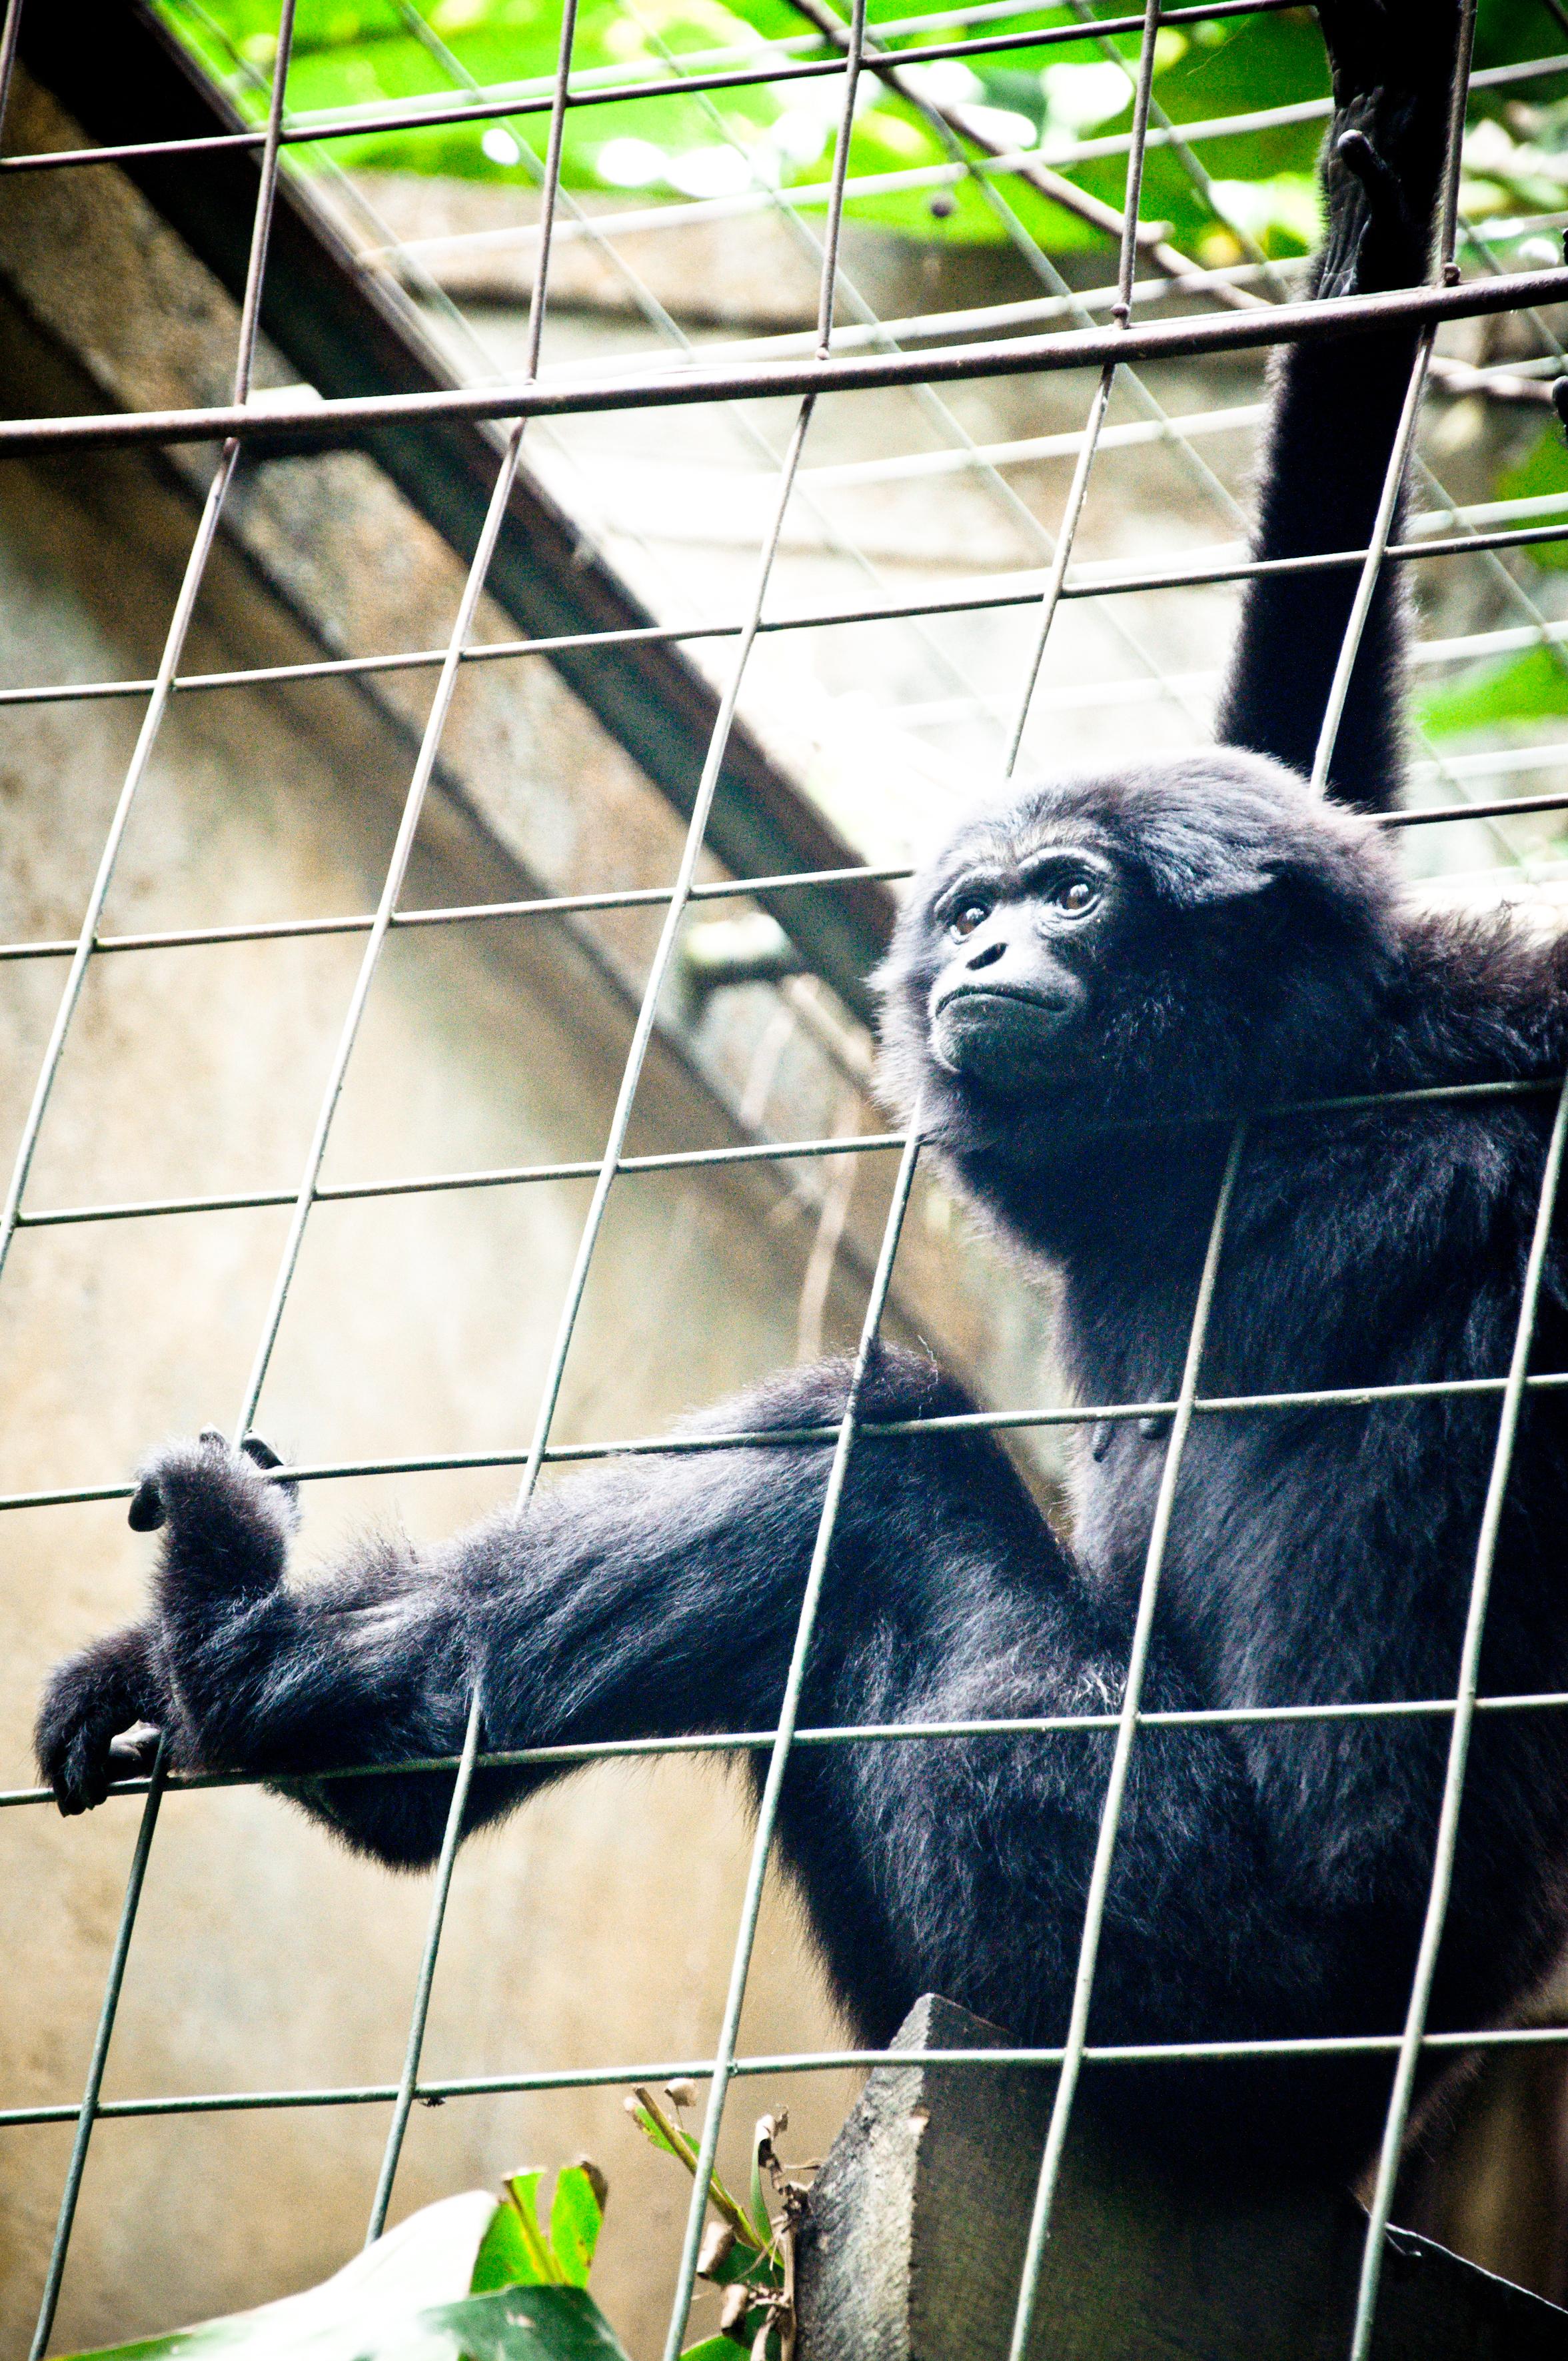 Monkey, Africa, Safari, Little, Mammal, HQ Photo